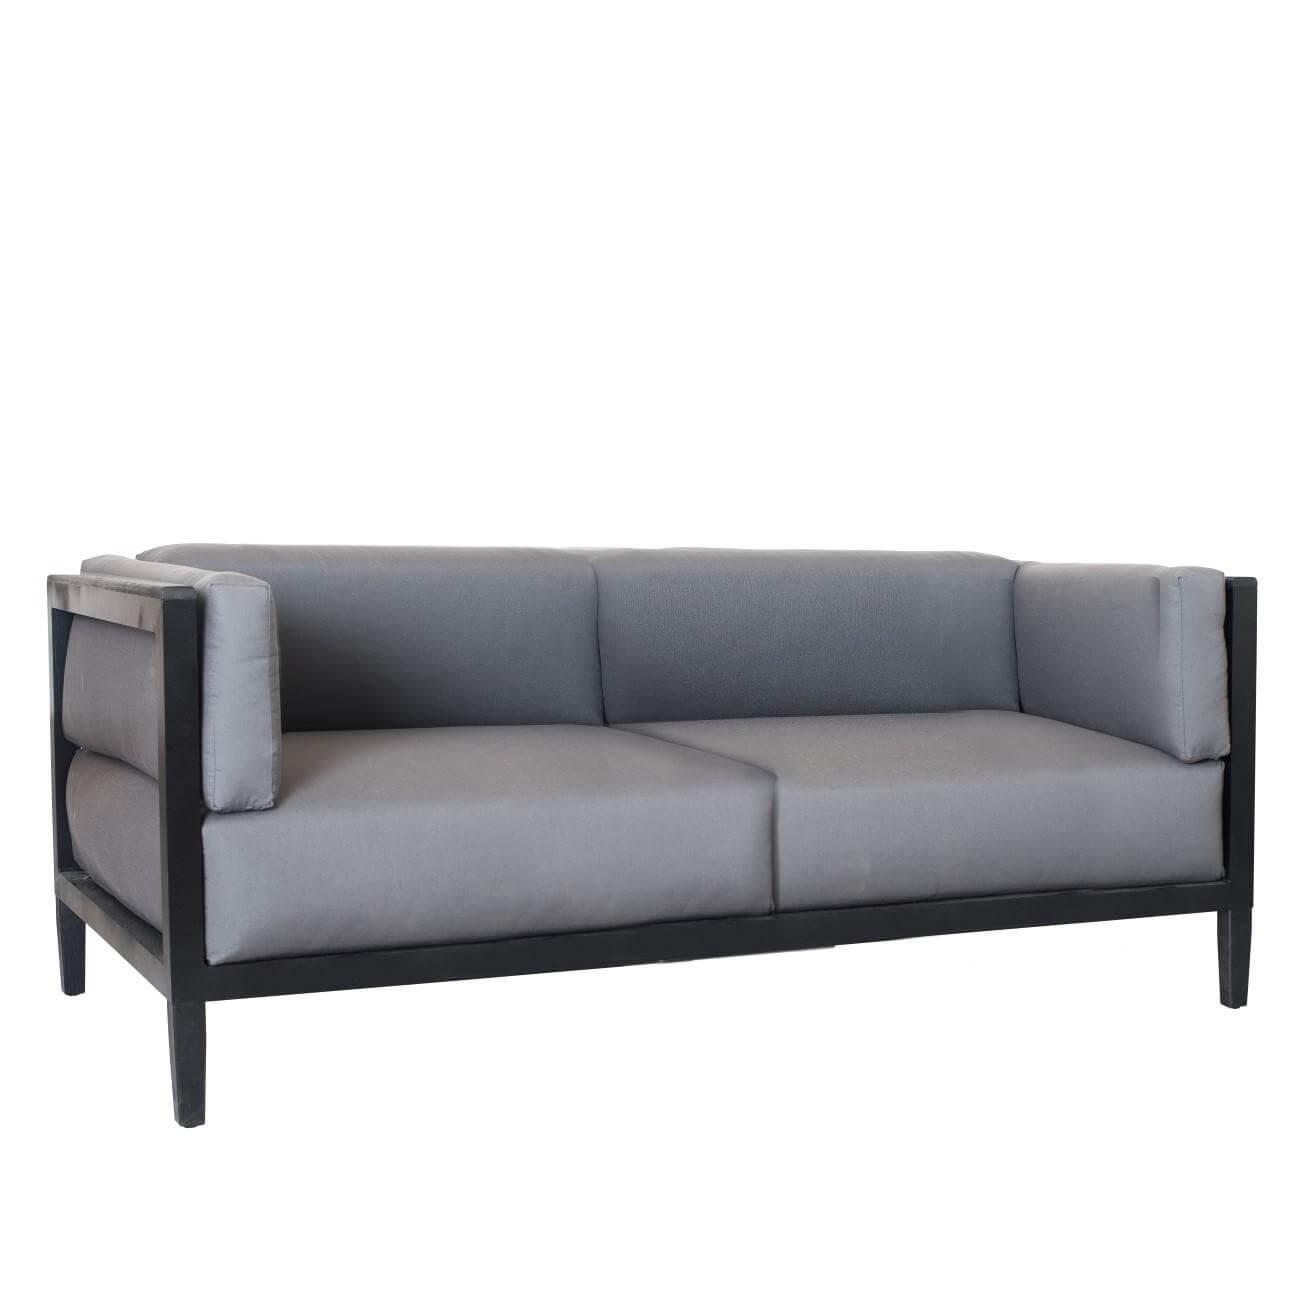 Градински диван, серия Panama